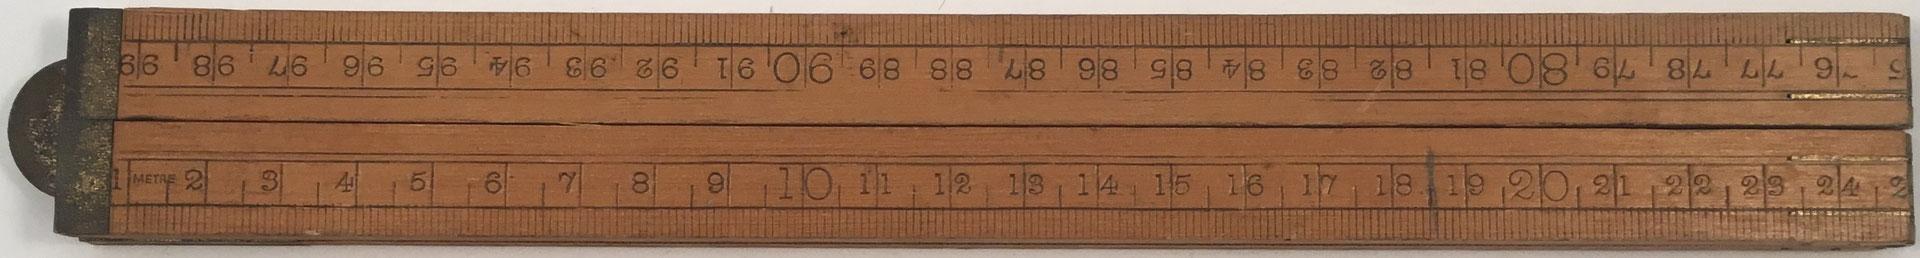 Antiguo metro plegable de madera sin marca